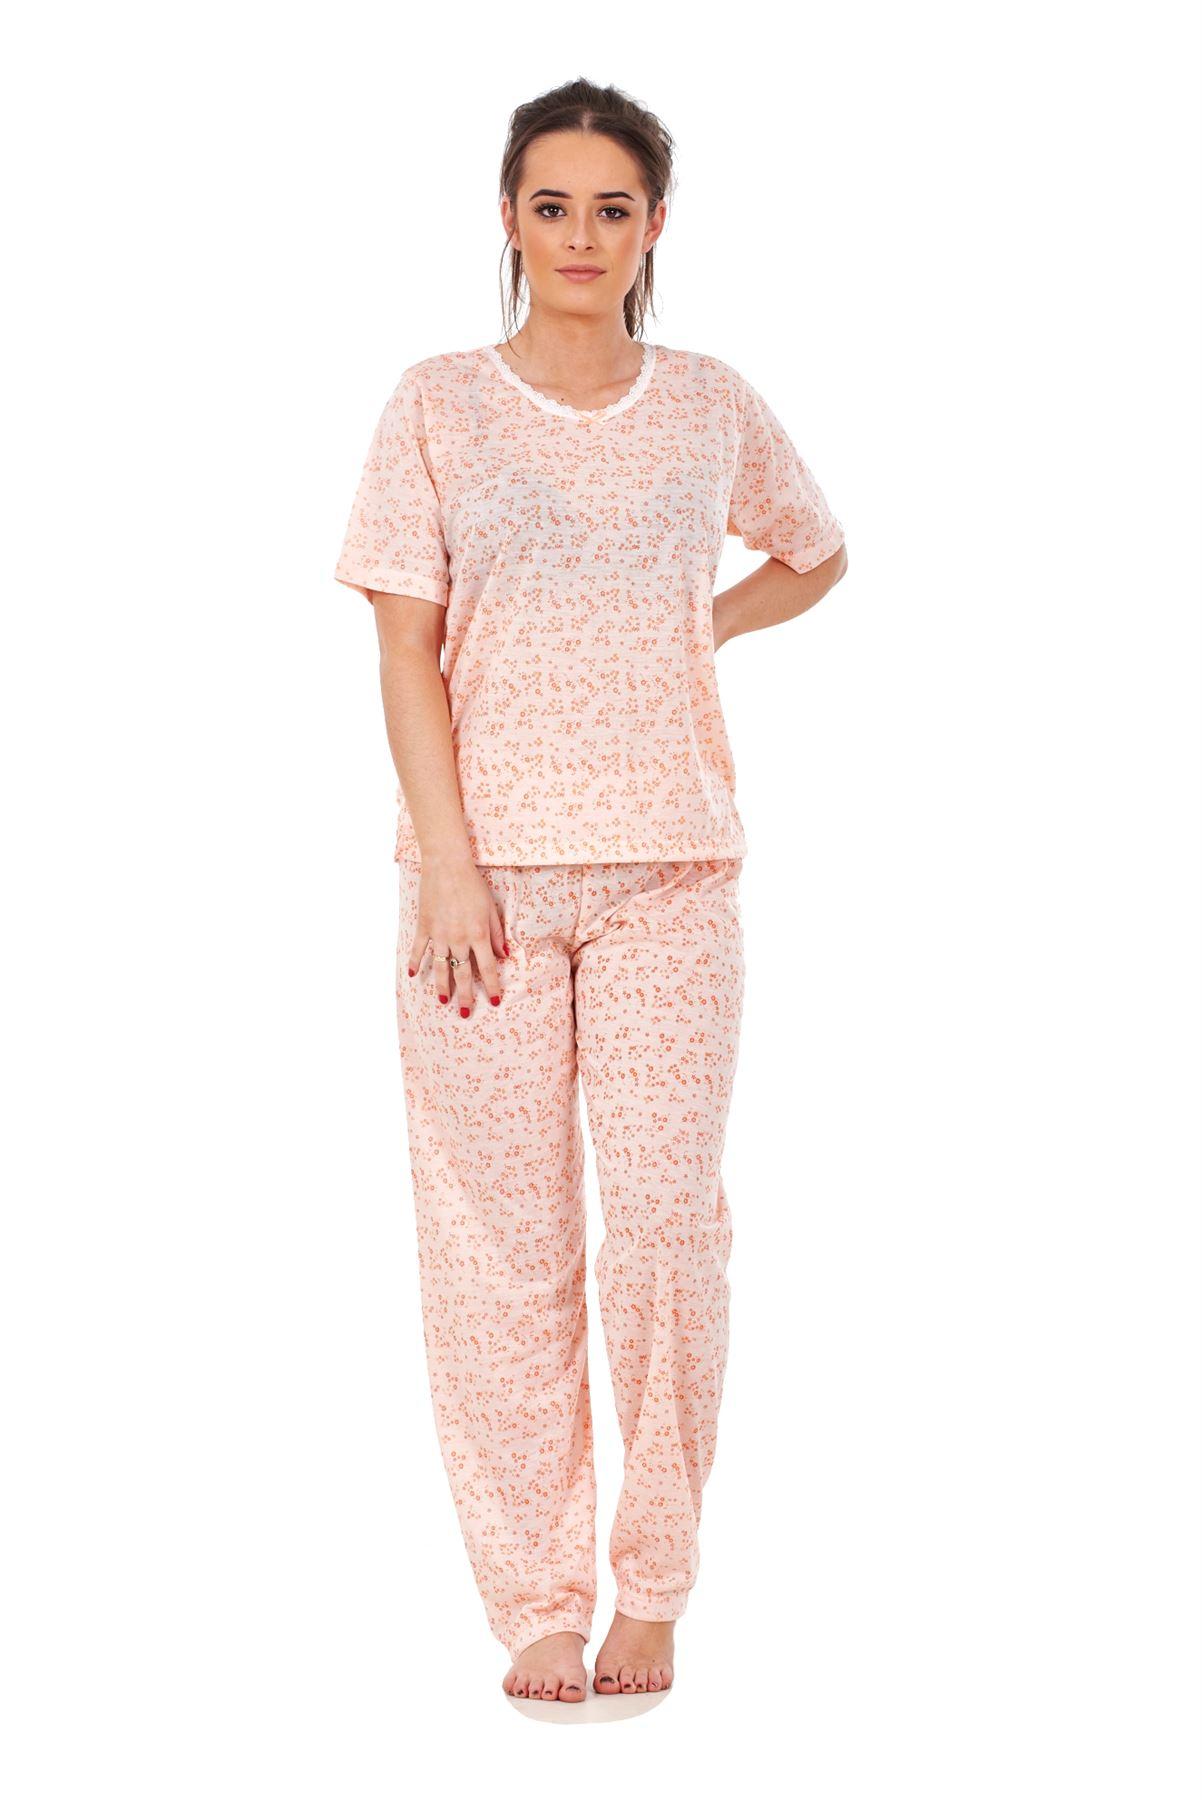 Ladies Floral Pyjama Sets Printed Short Sleeve Crew Neck Nightwear PJ's S to XXL